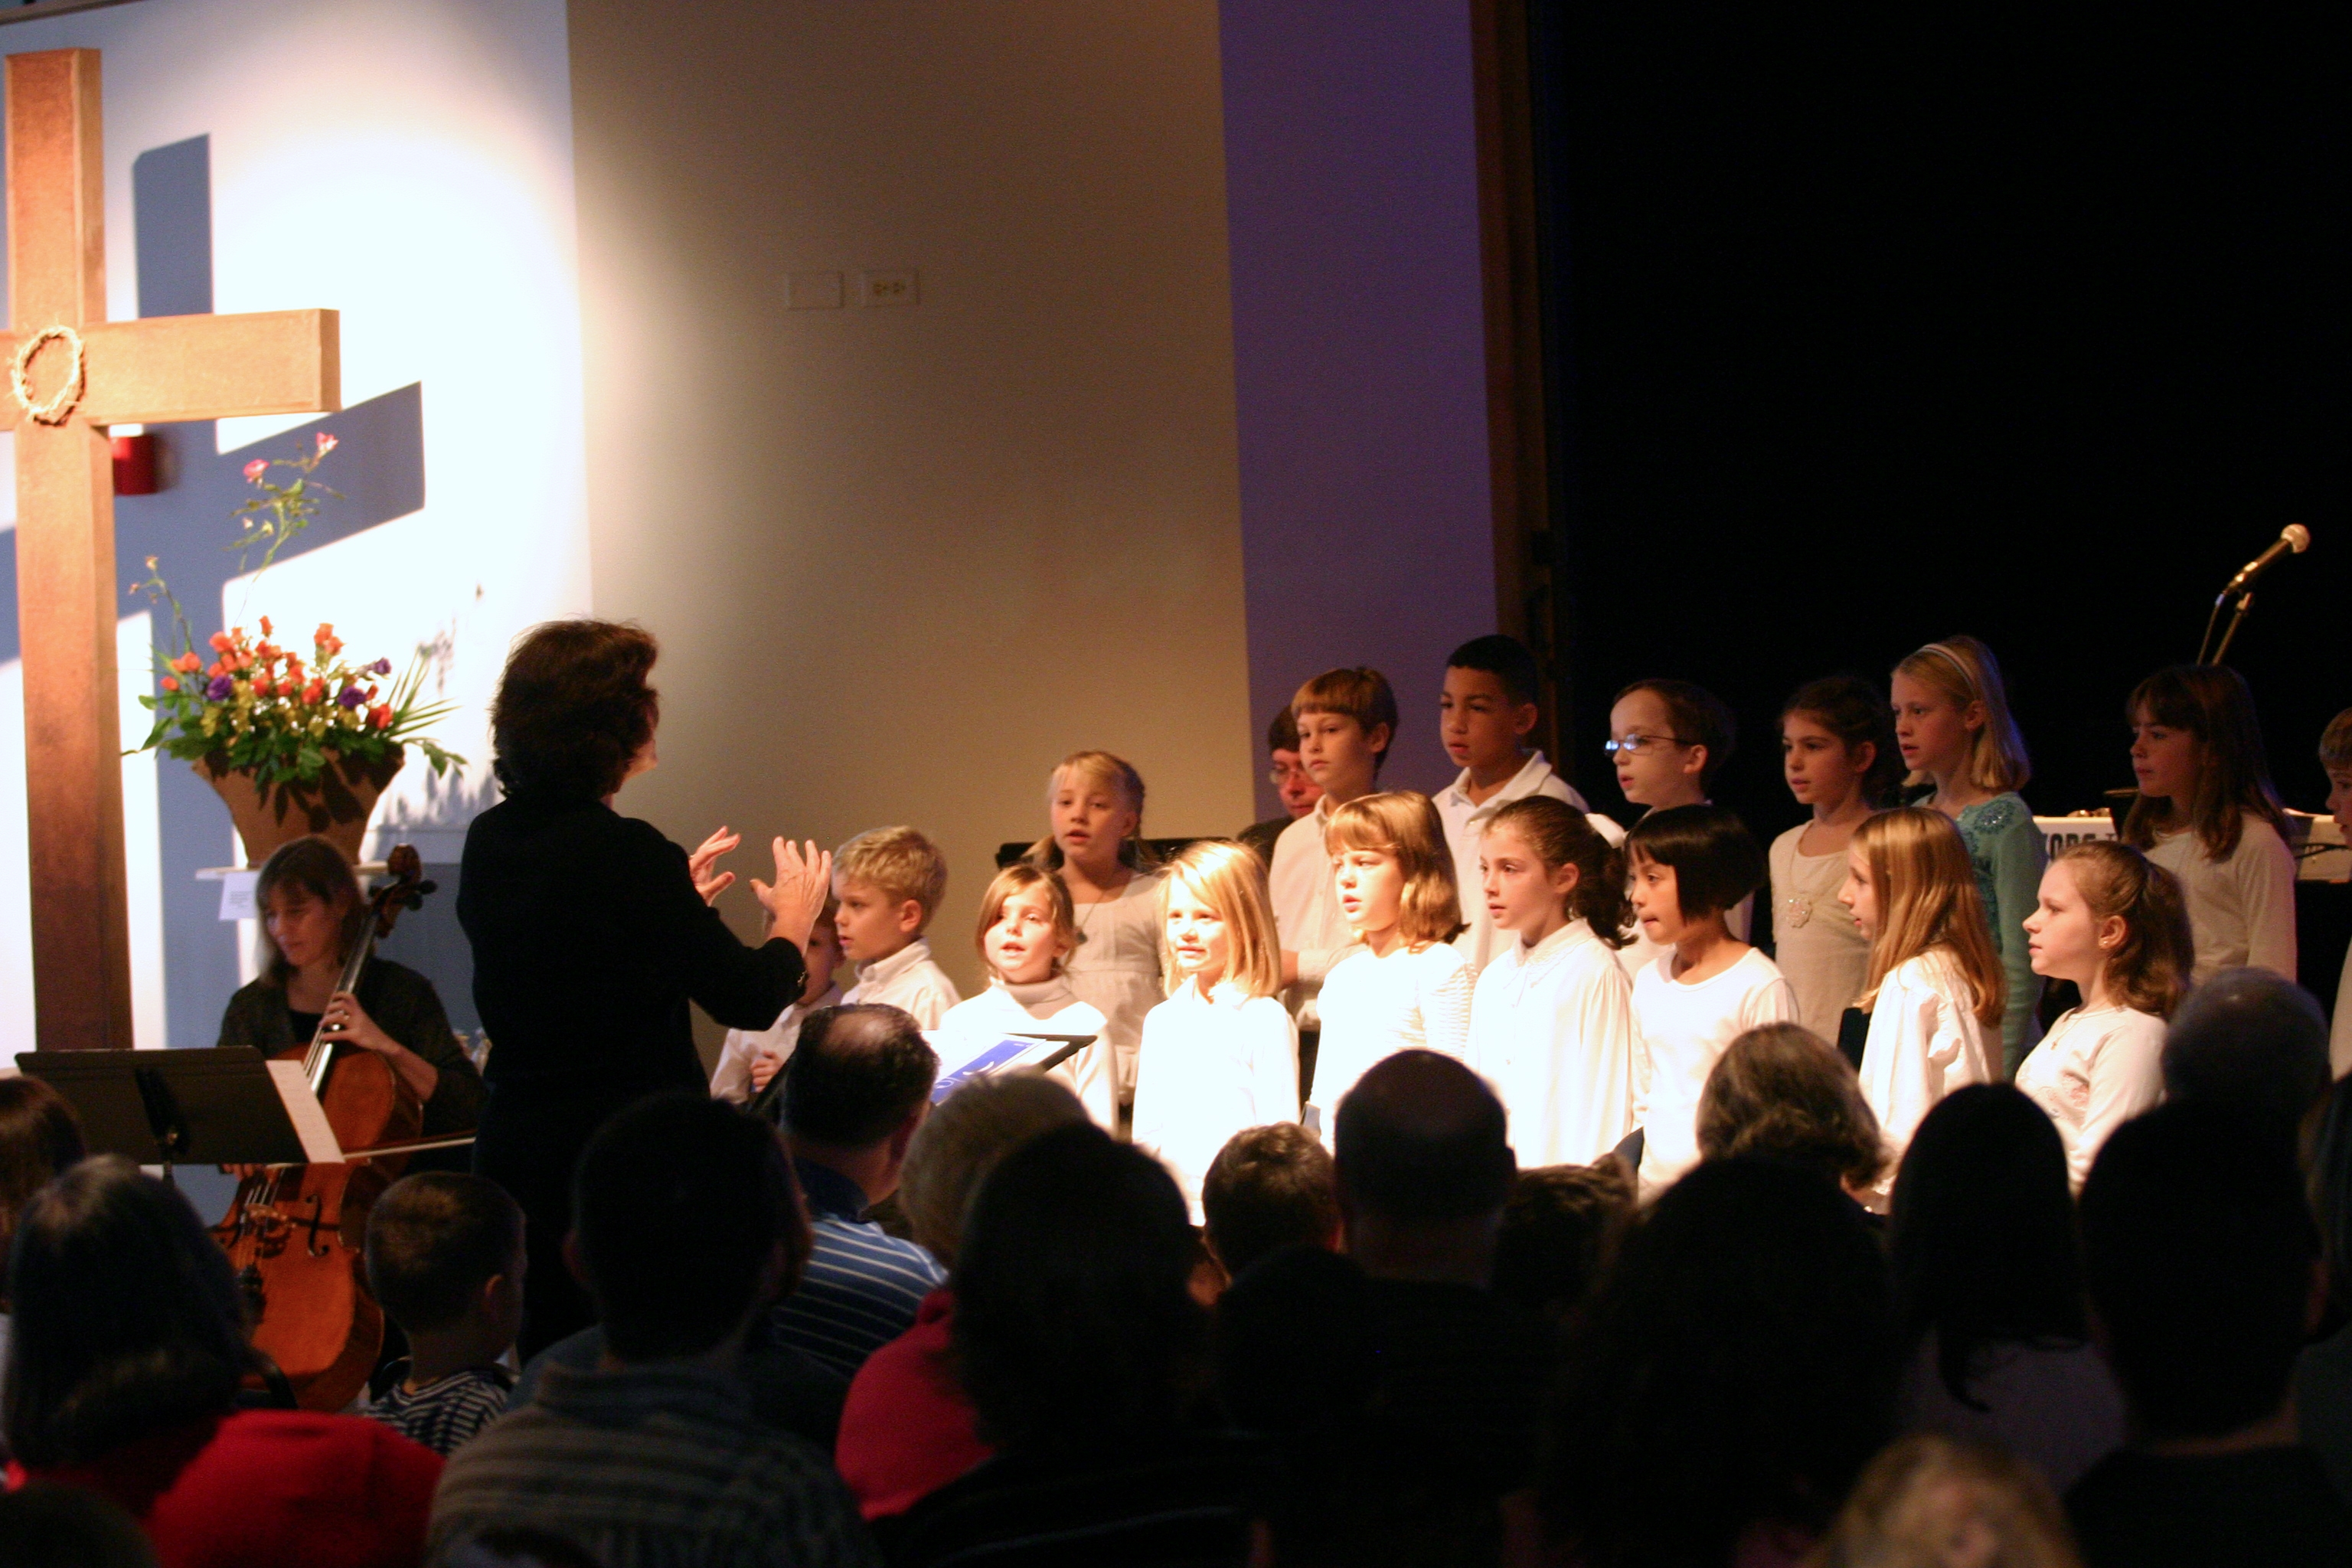 First year directing the Junior Choir at First Presbyterian Church